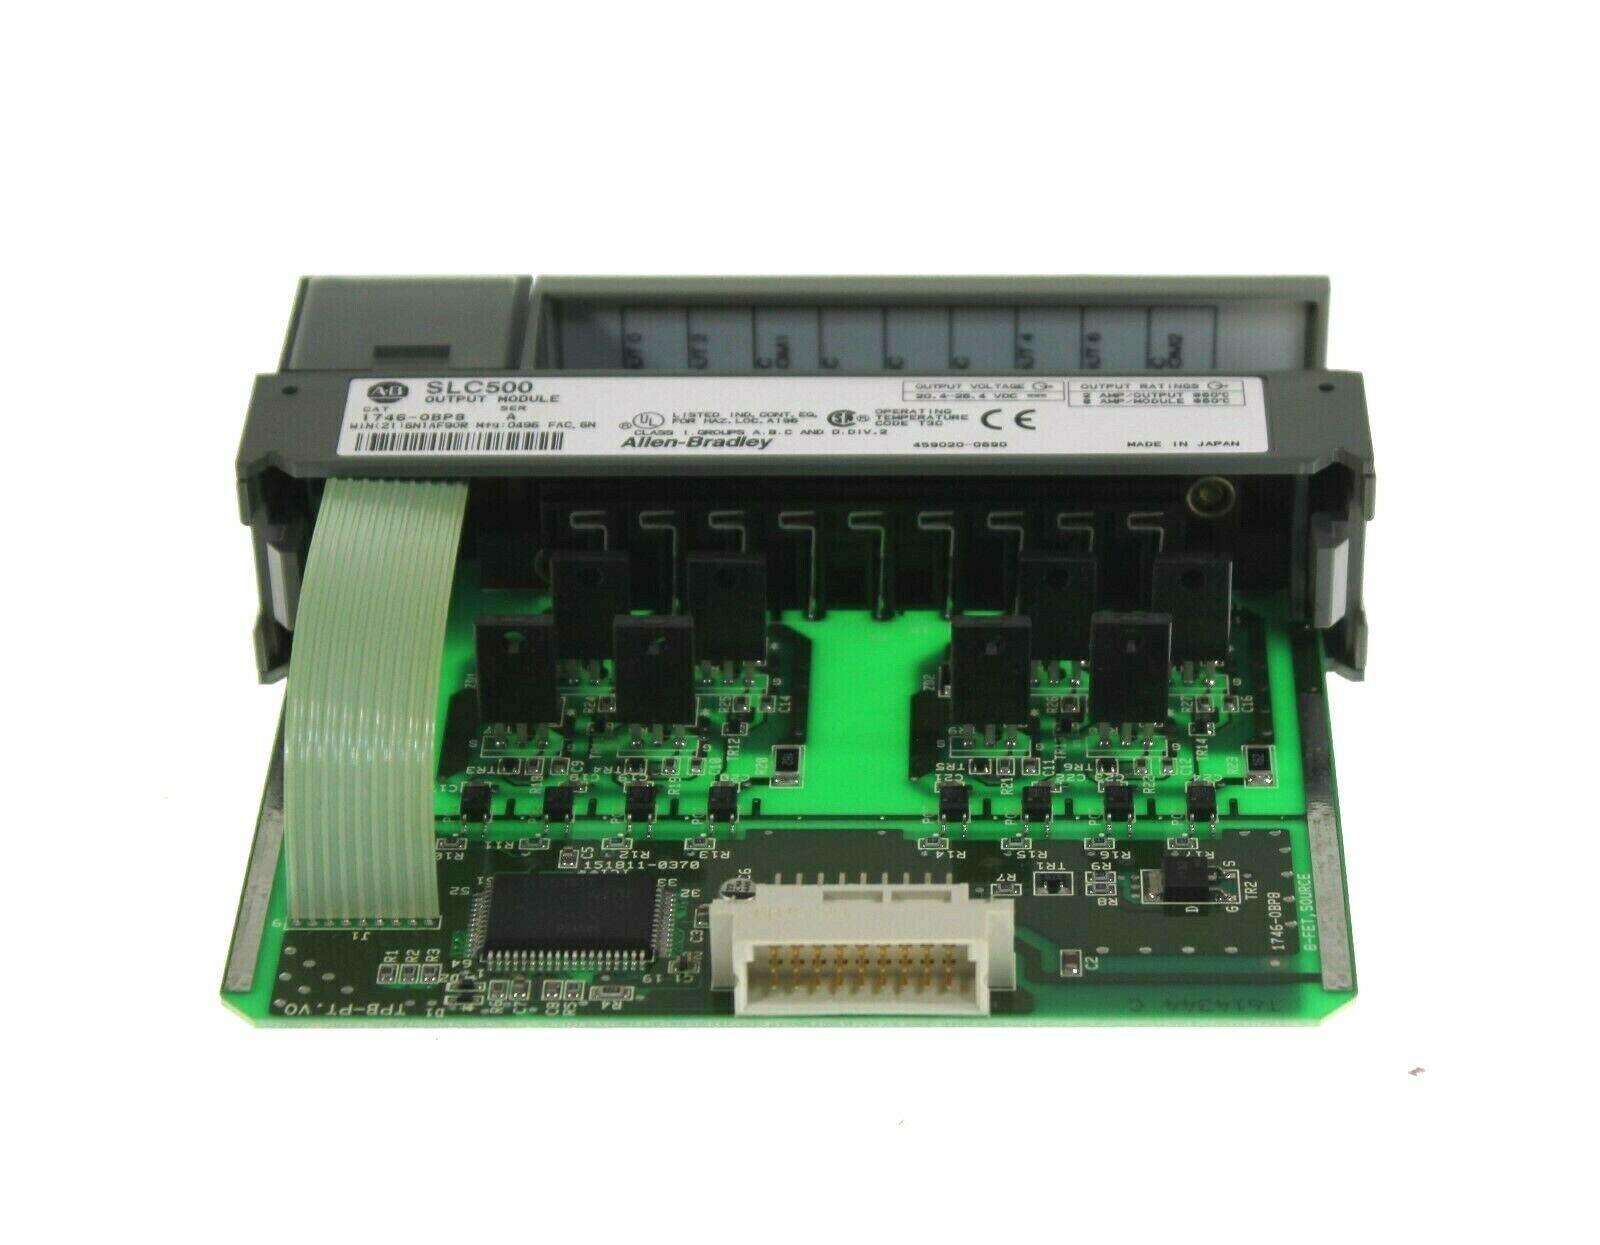 1746-OBP8A 8点数字量输出模块SLC 8 Point Digital Output Module